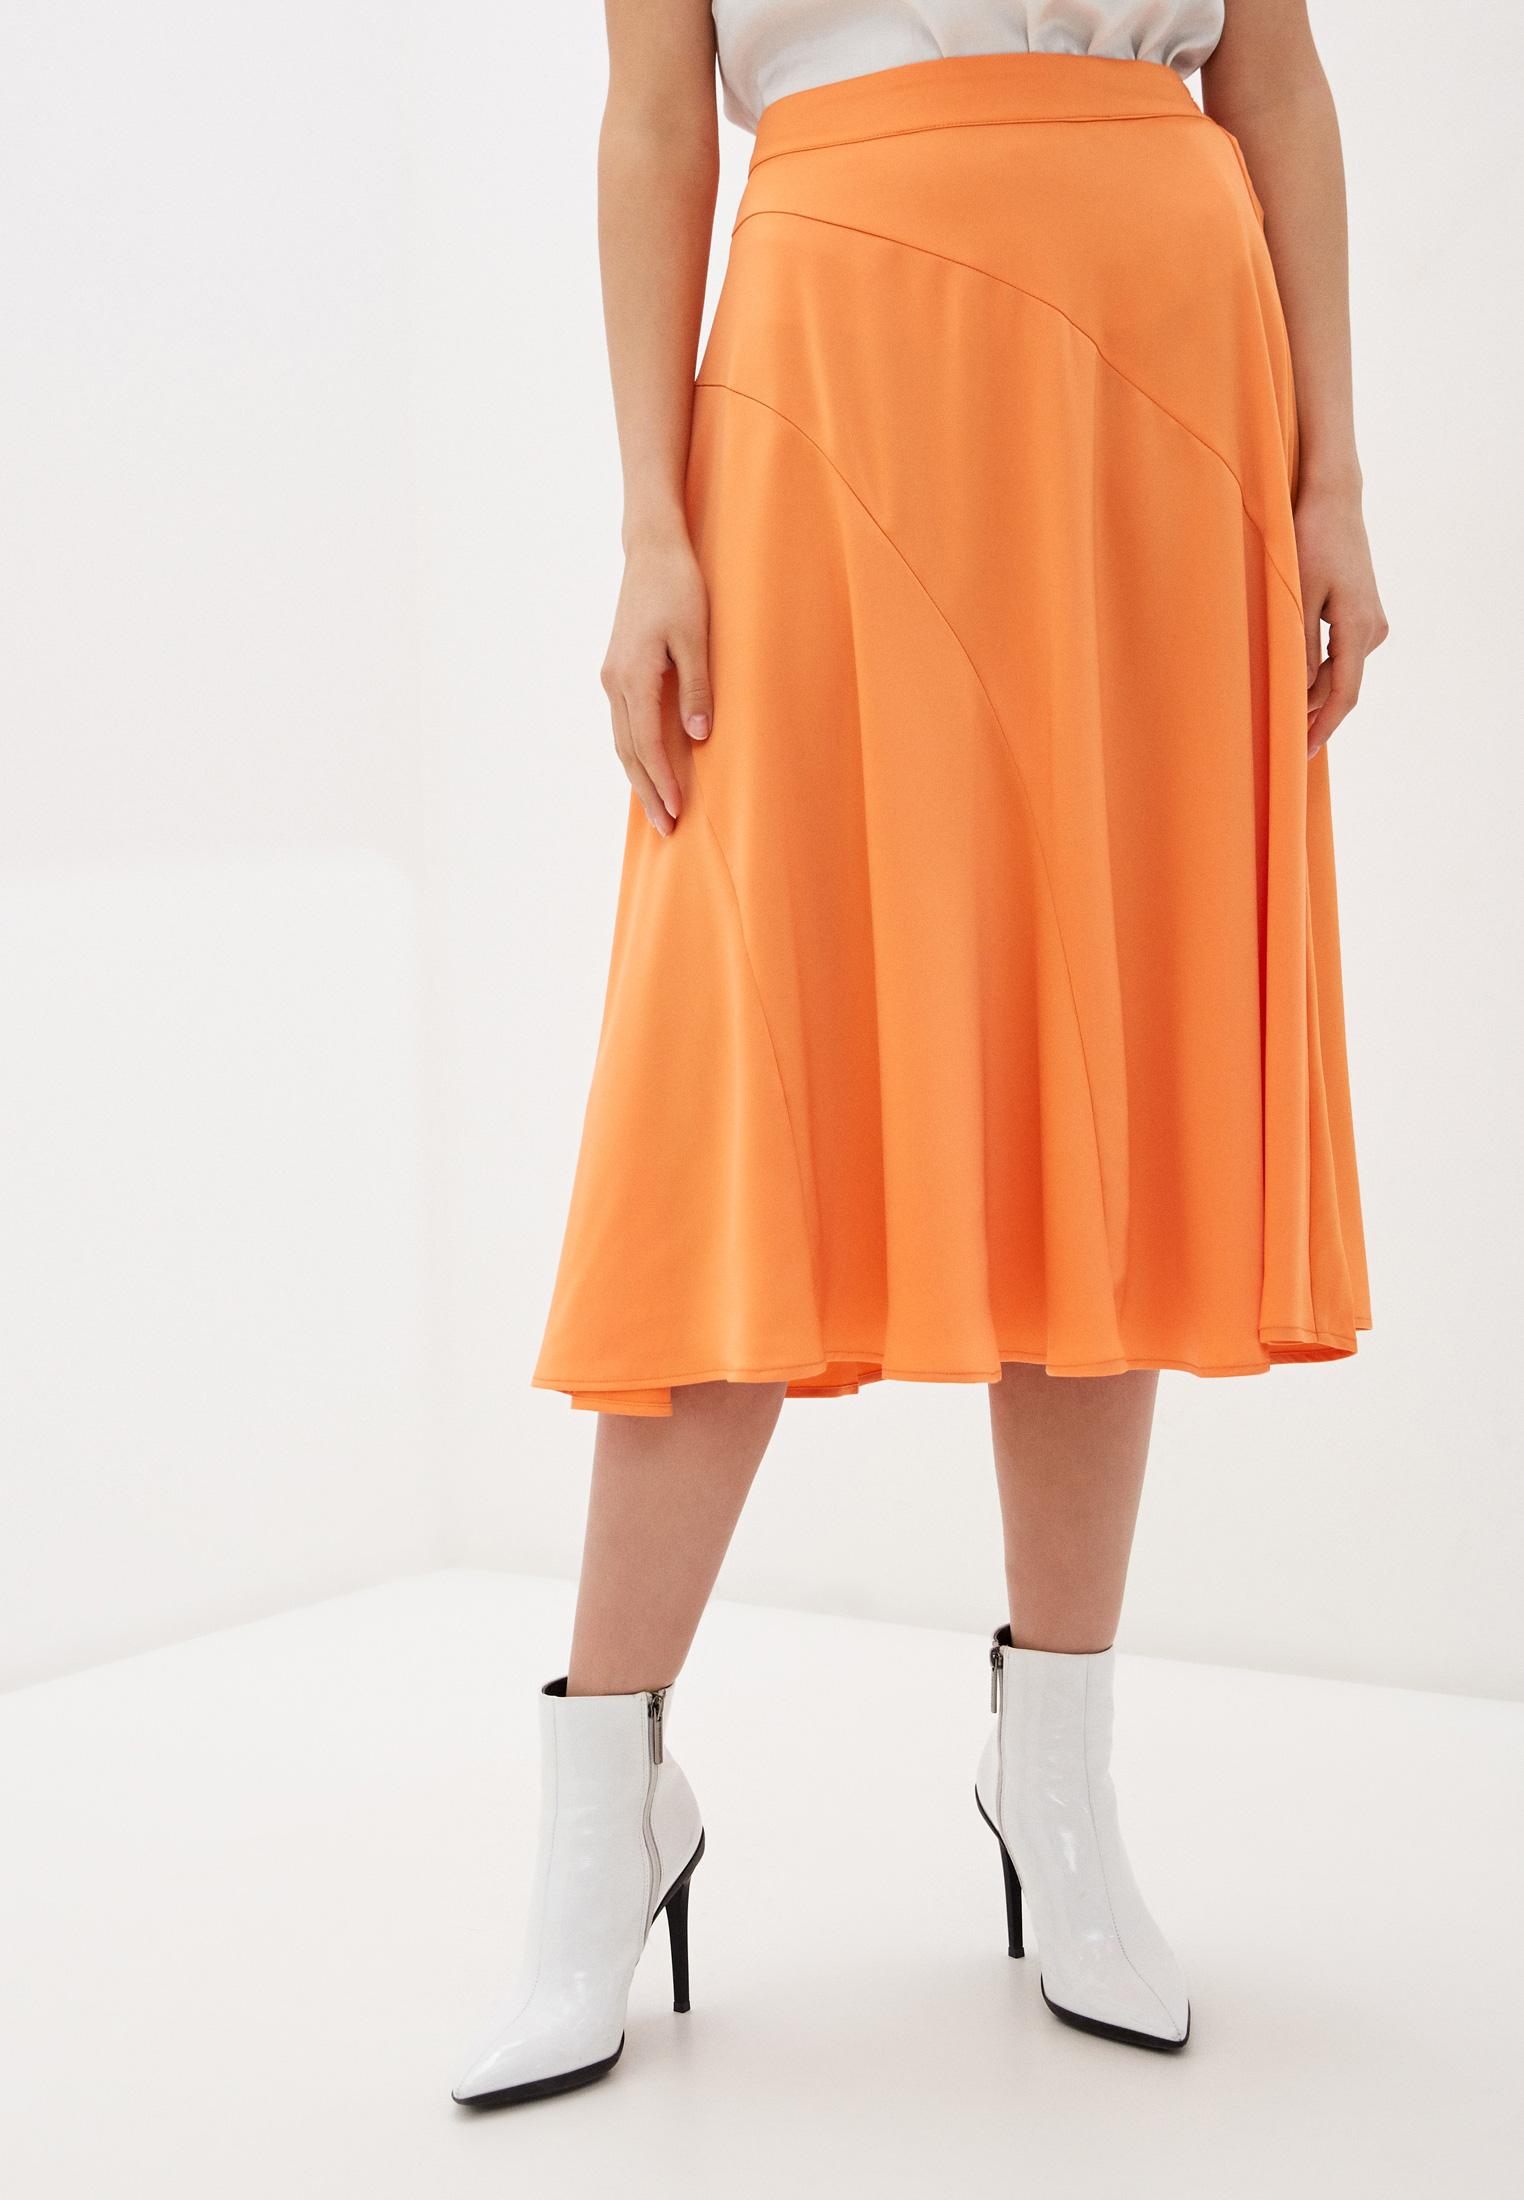 Широкая юбка Vero Moda (Веро Мода) 10225727